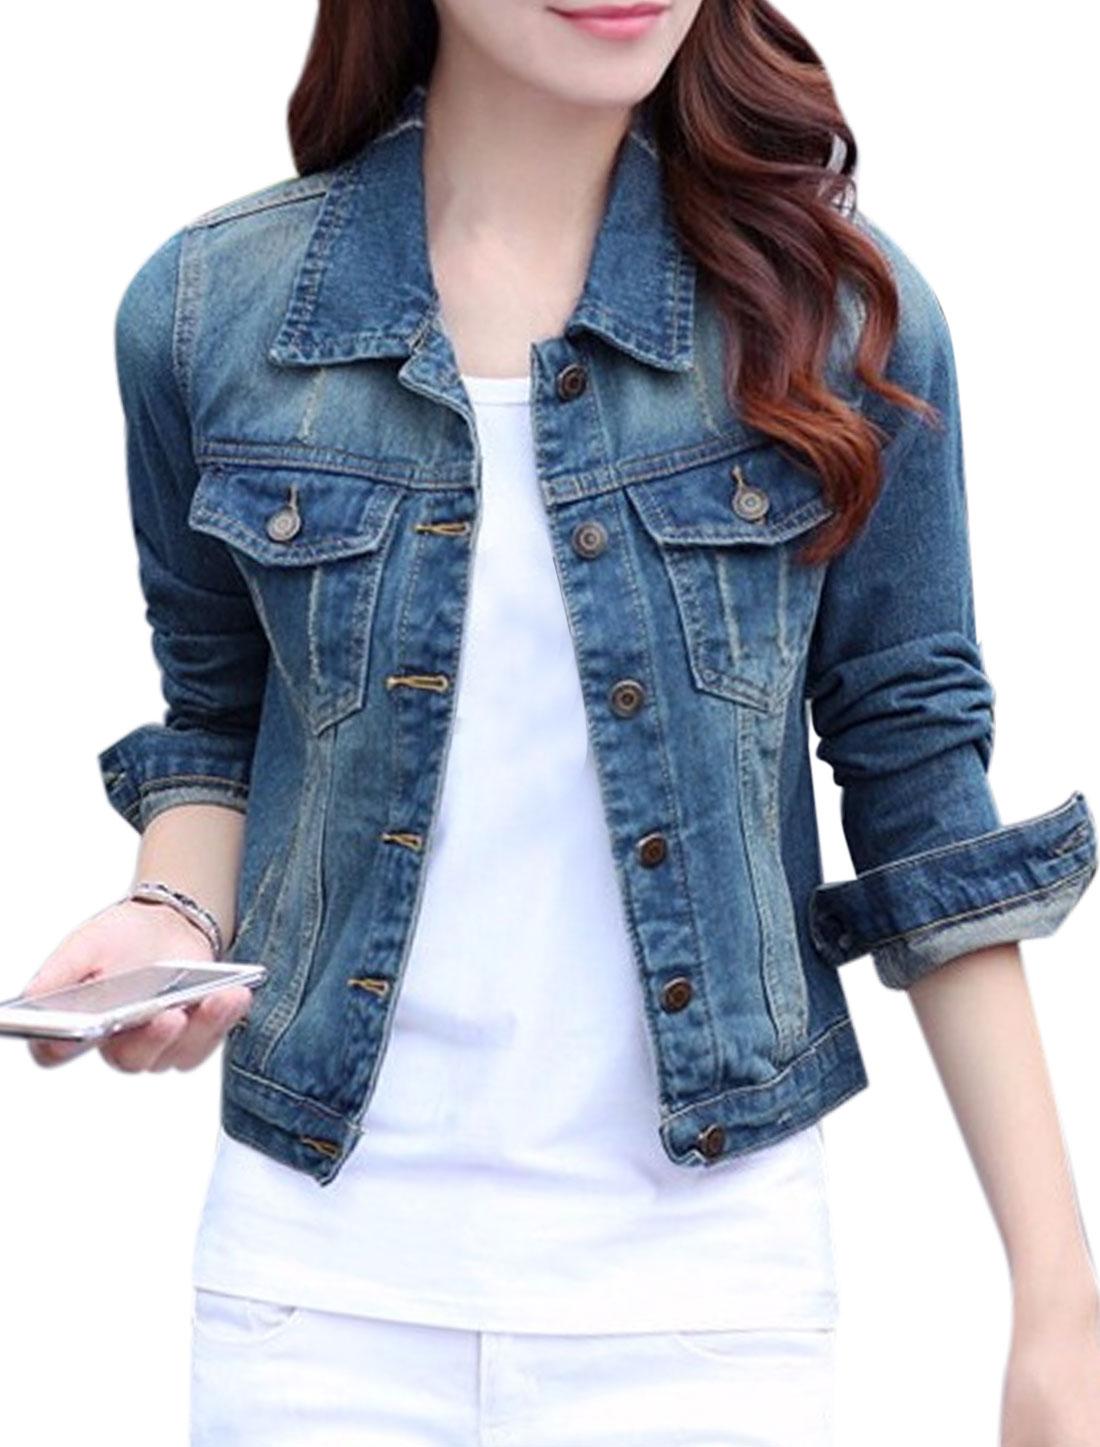 Women Distressed Detail Button Closure Cropped Jean Jacket Blue M